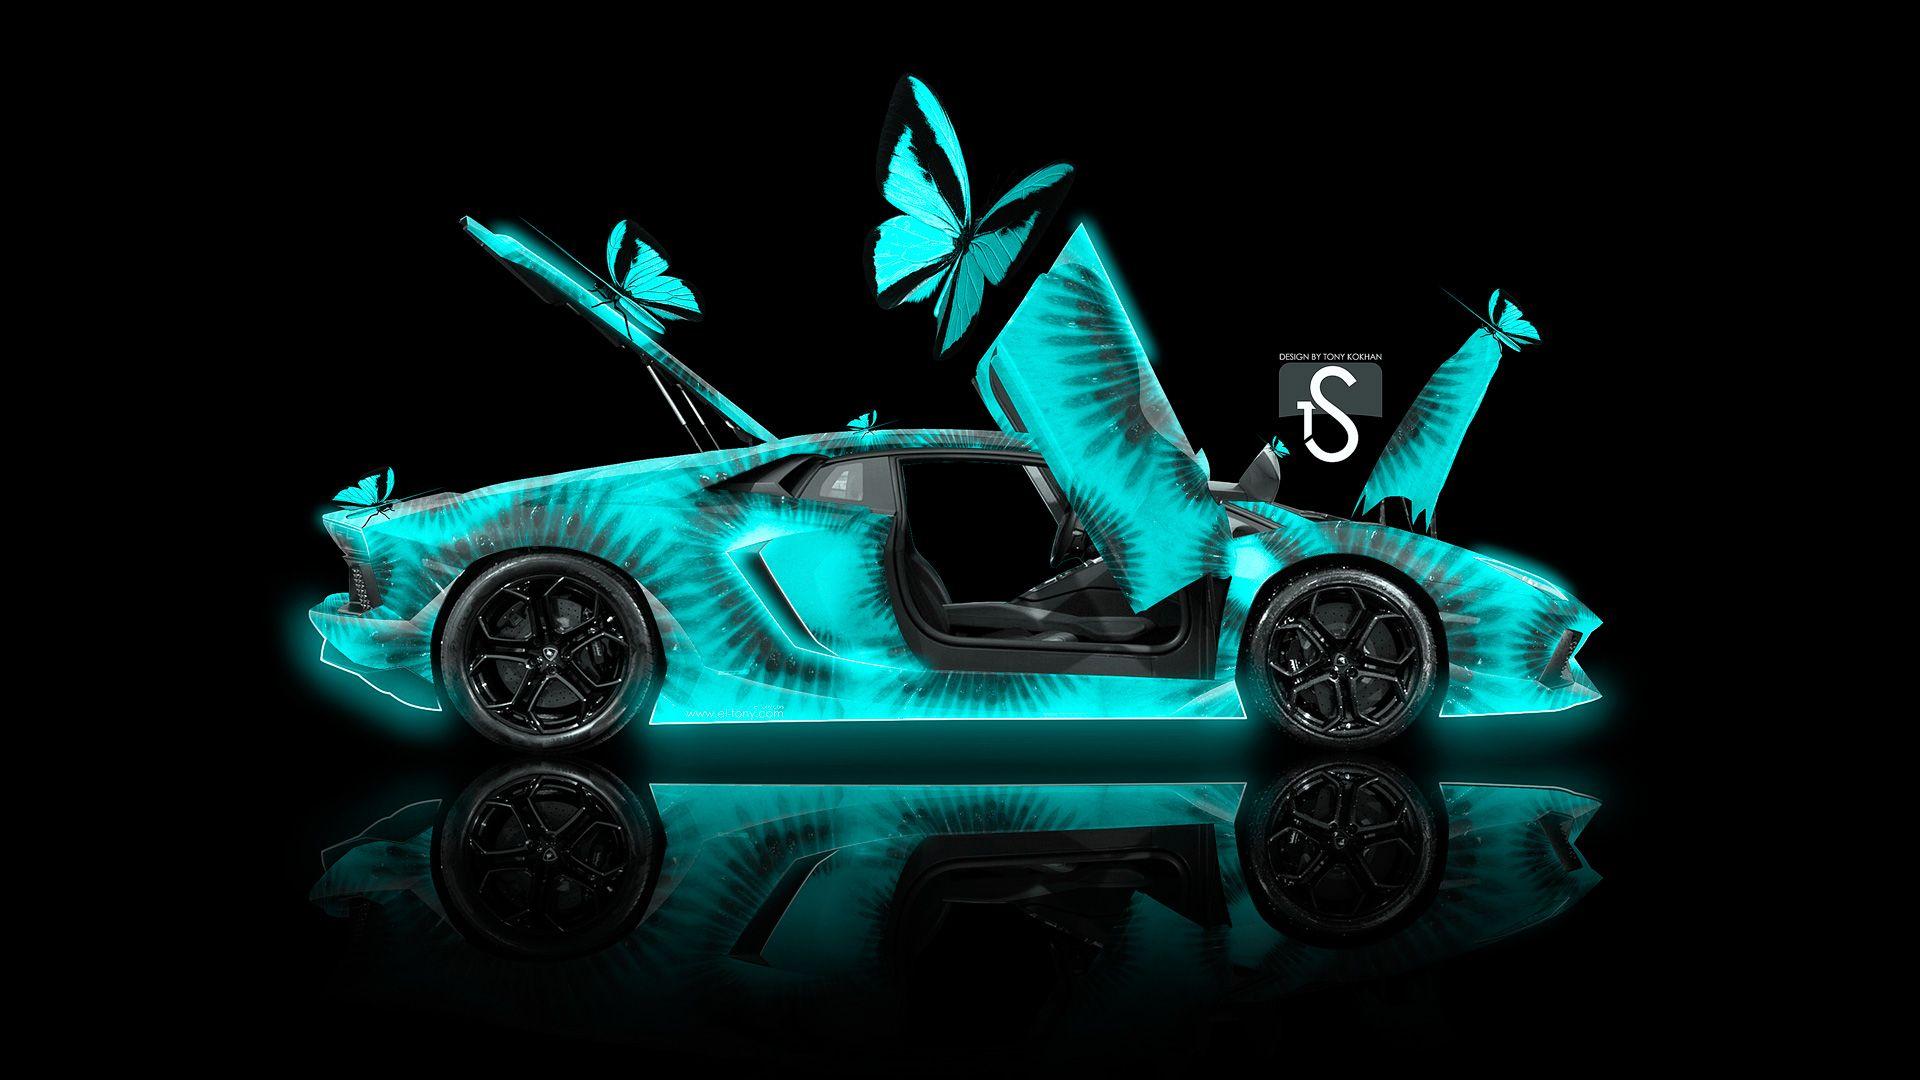 Exceptionnel Lamborghini Aventador Fantasy Azure Butterfly Kiwi Car 2013